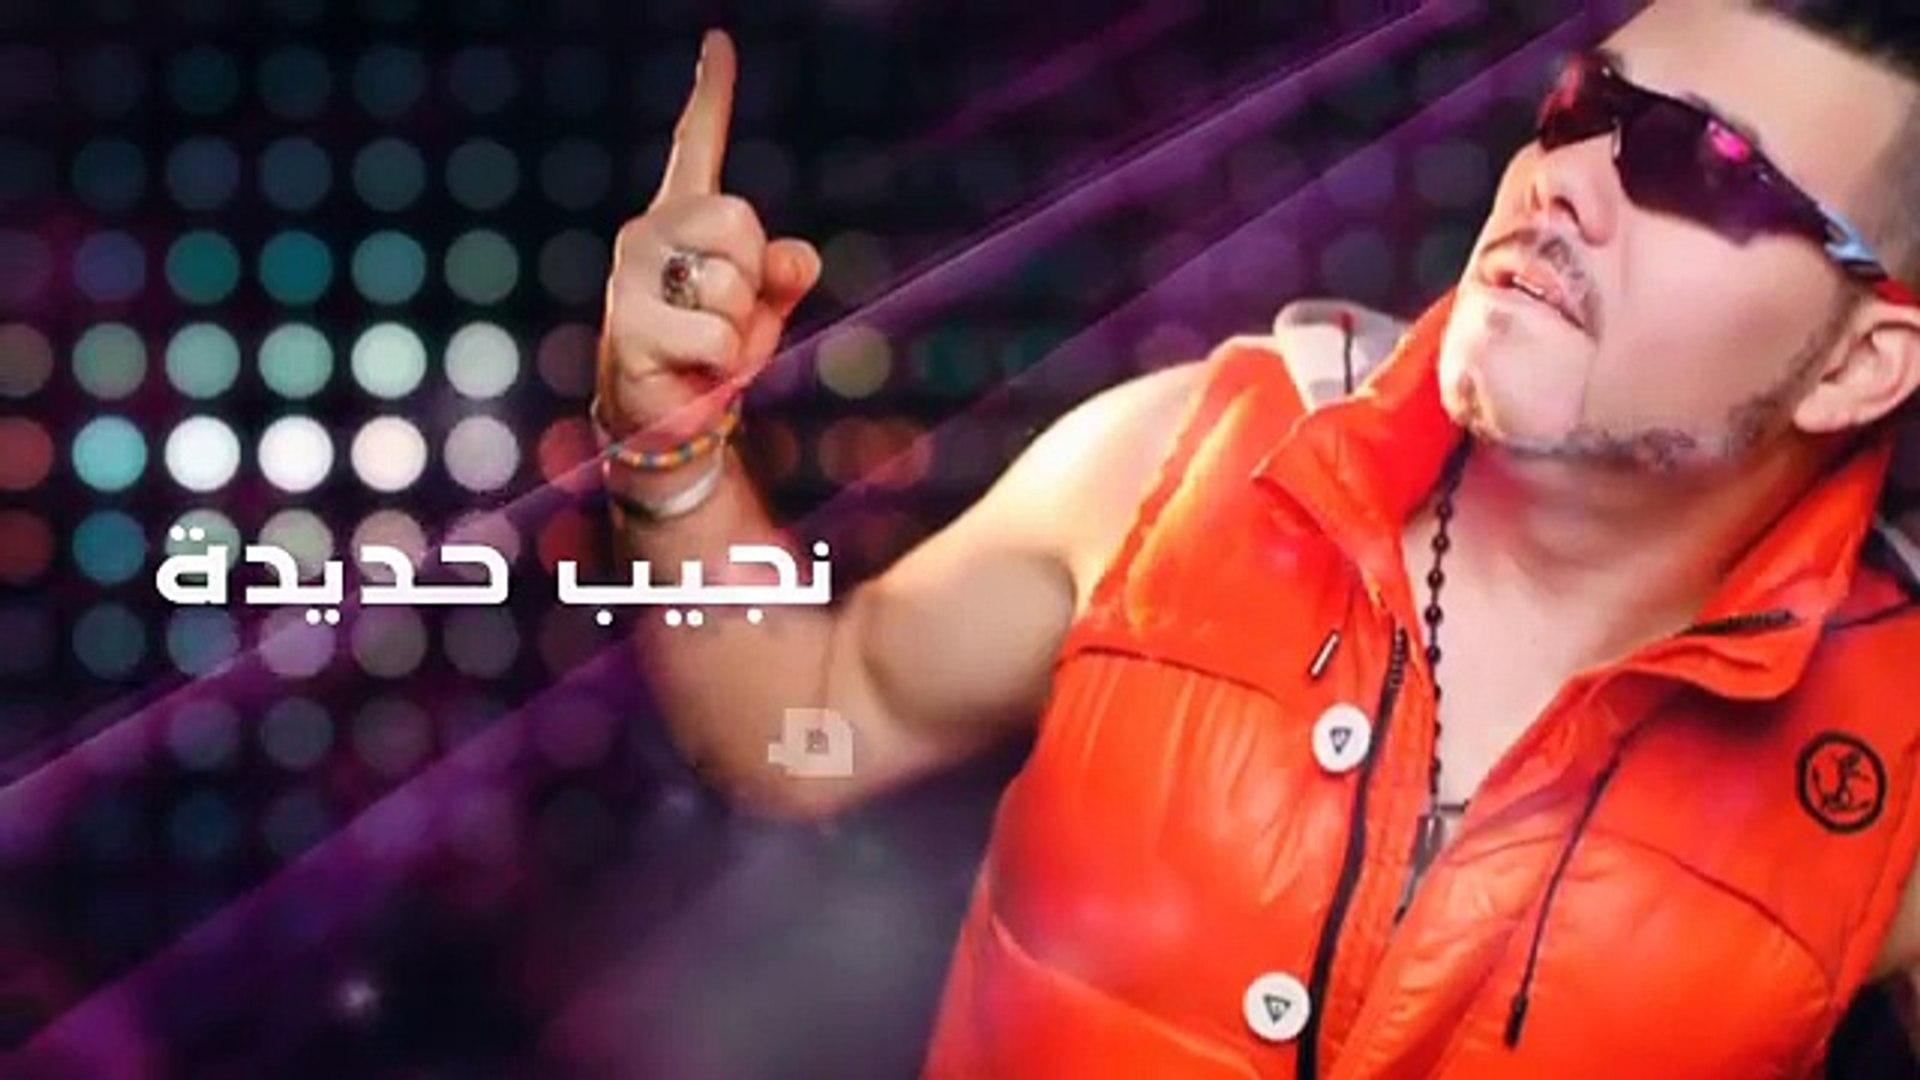 Adil El Miloudi - Allah Ykemel عادل الميلودي - الله يكمل 2015